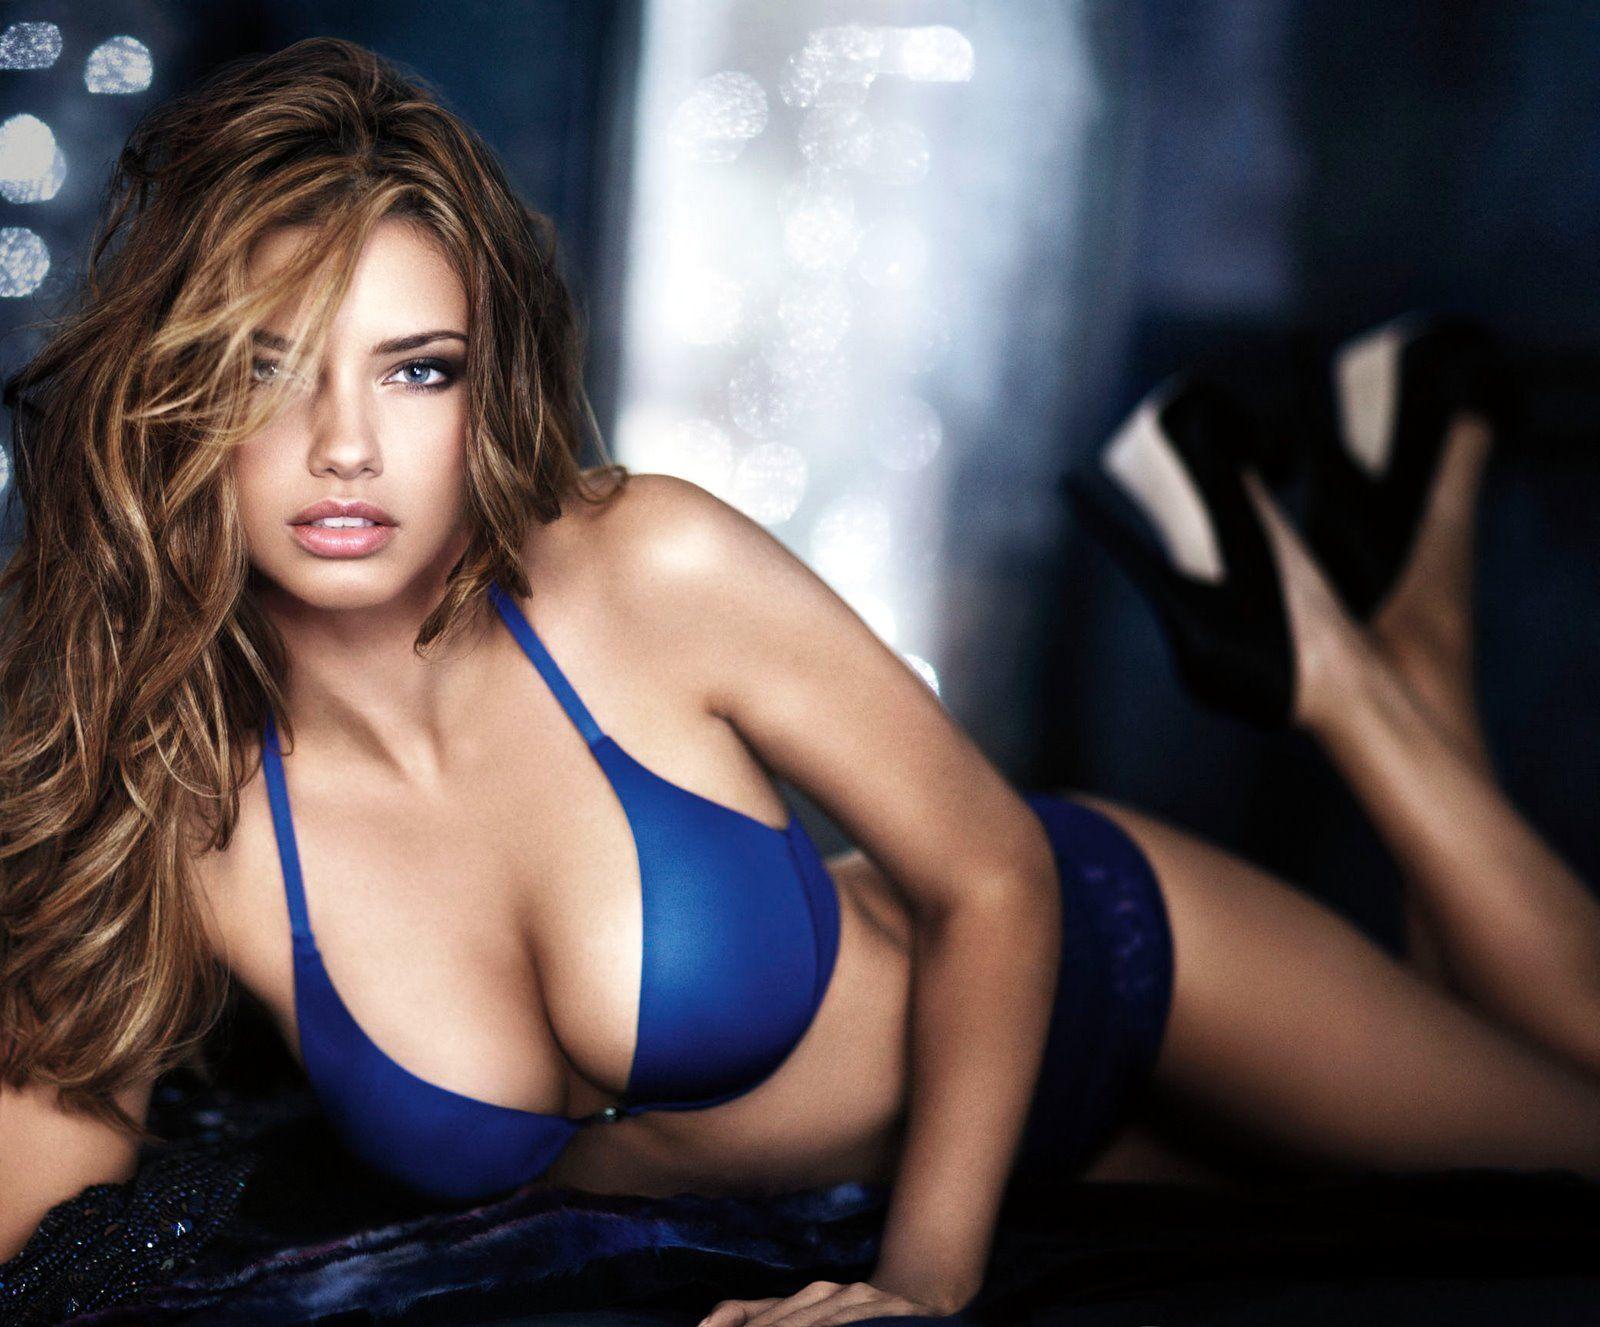 Paris hilton boobs nude